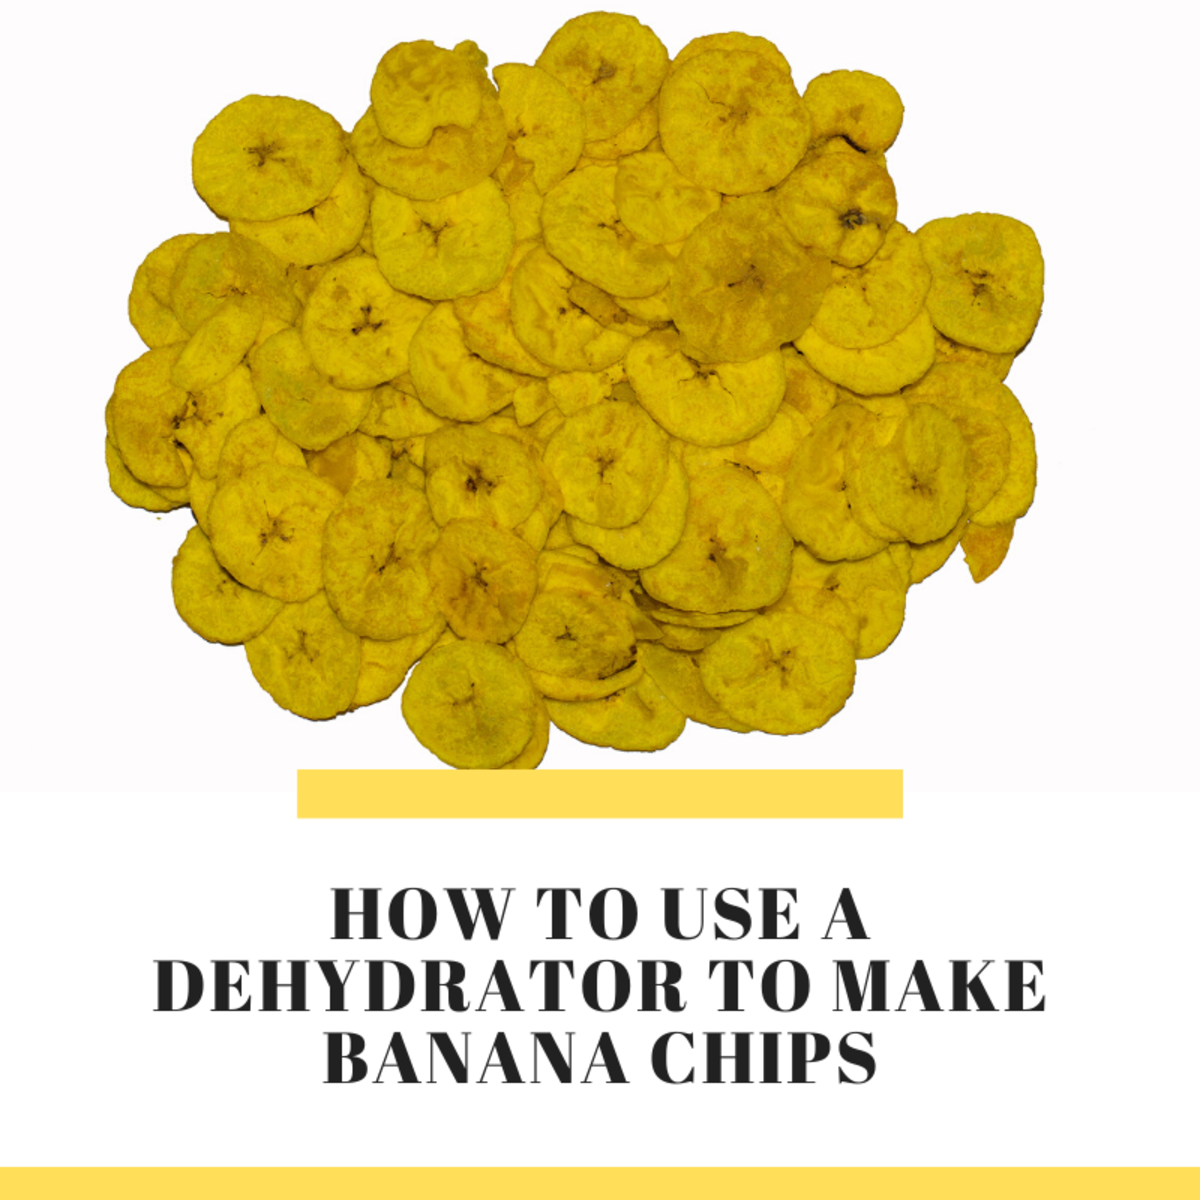 Tips for Using a Dehydrator & Banana Chip Recipe